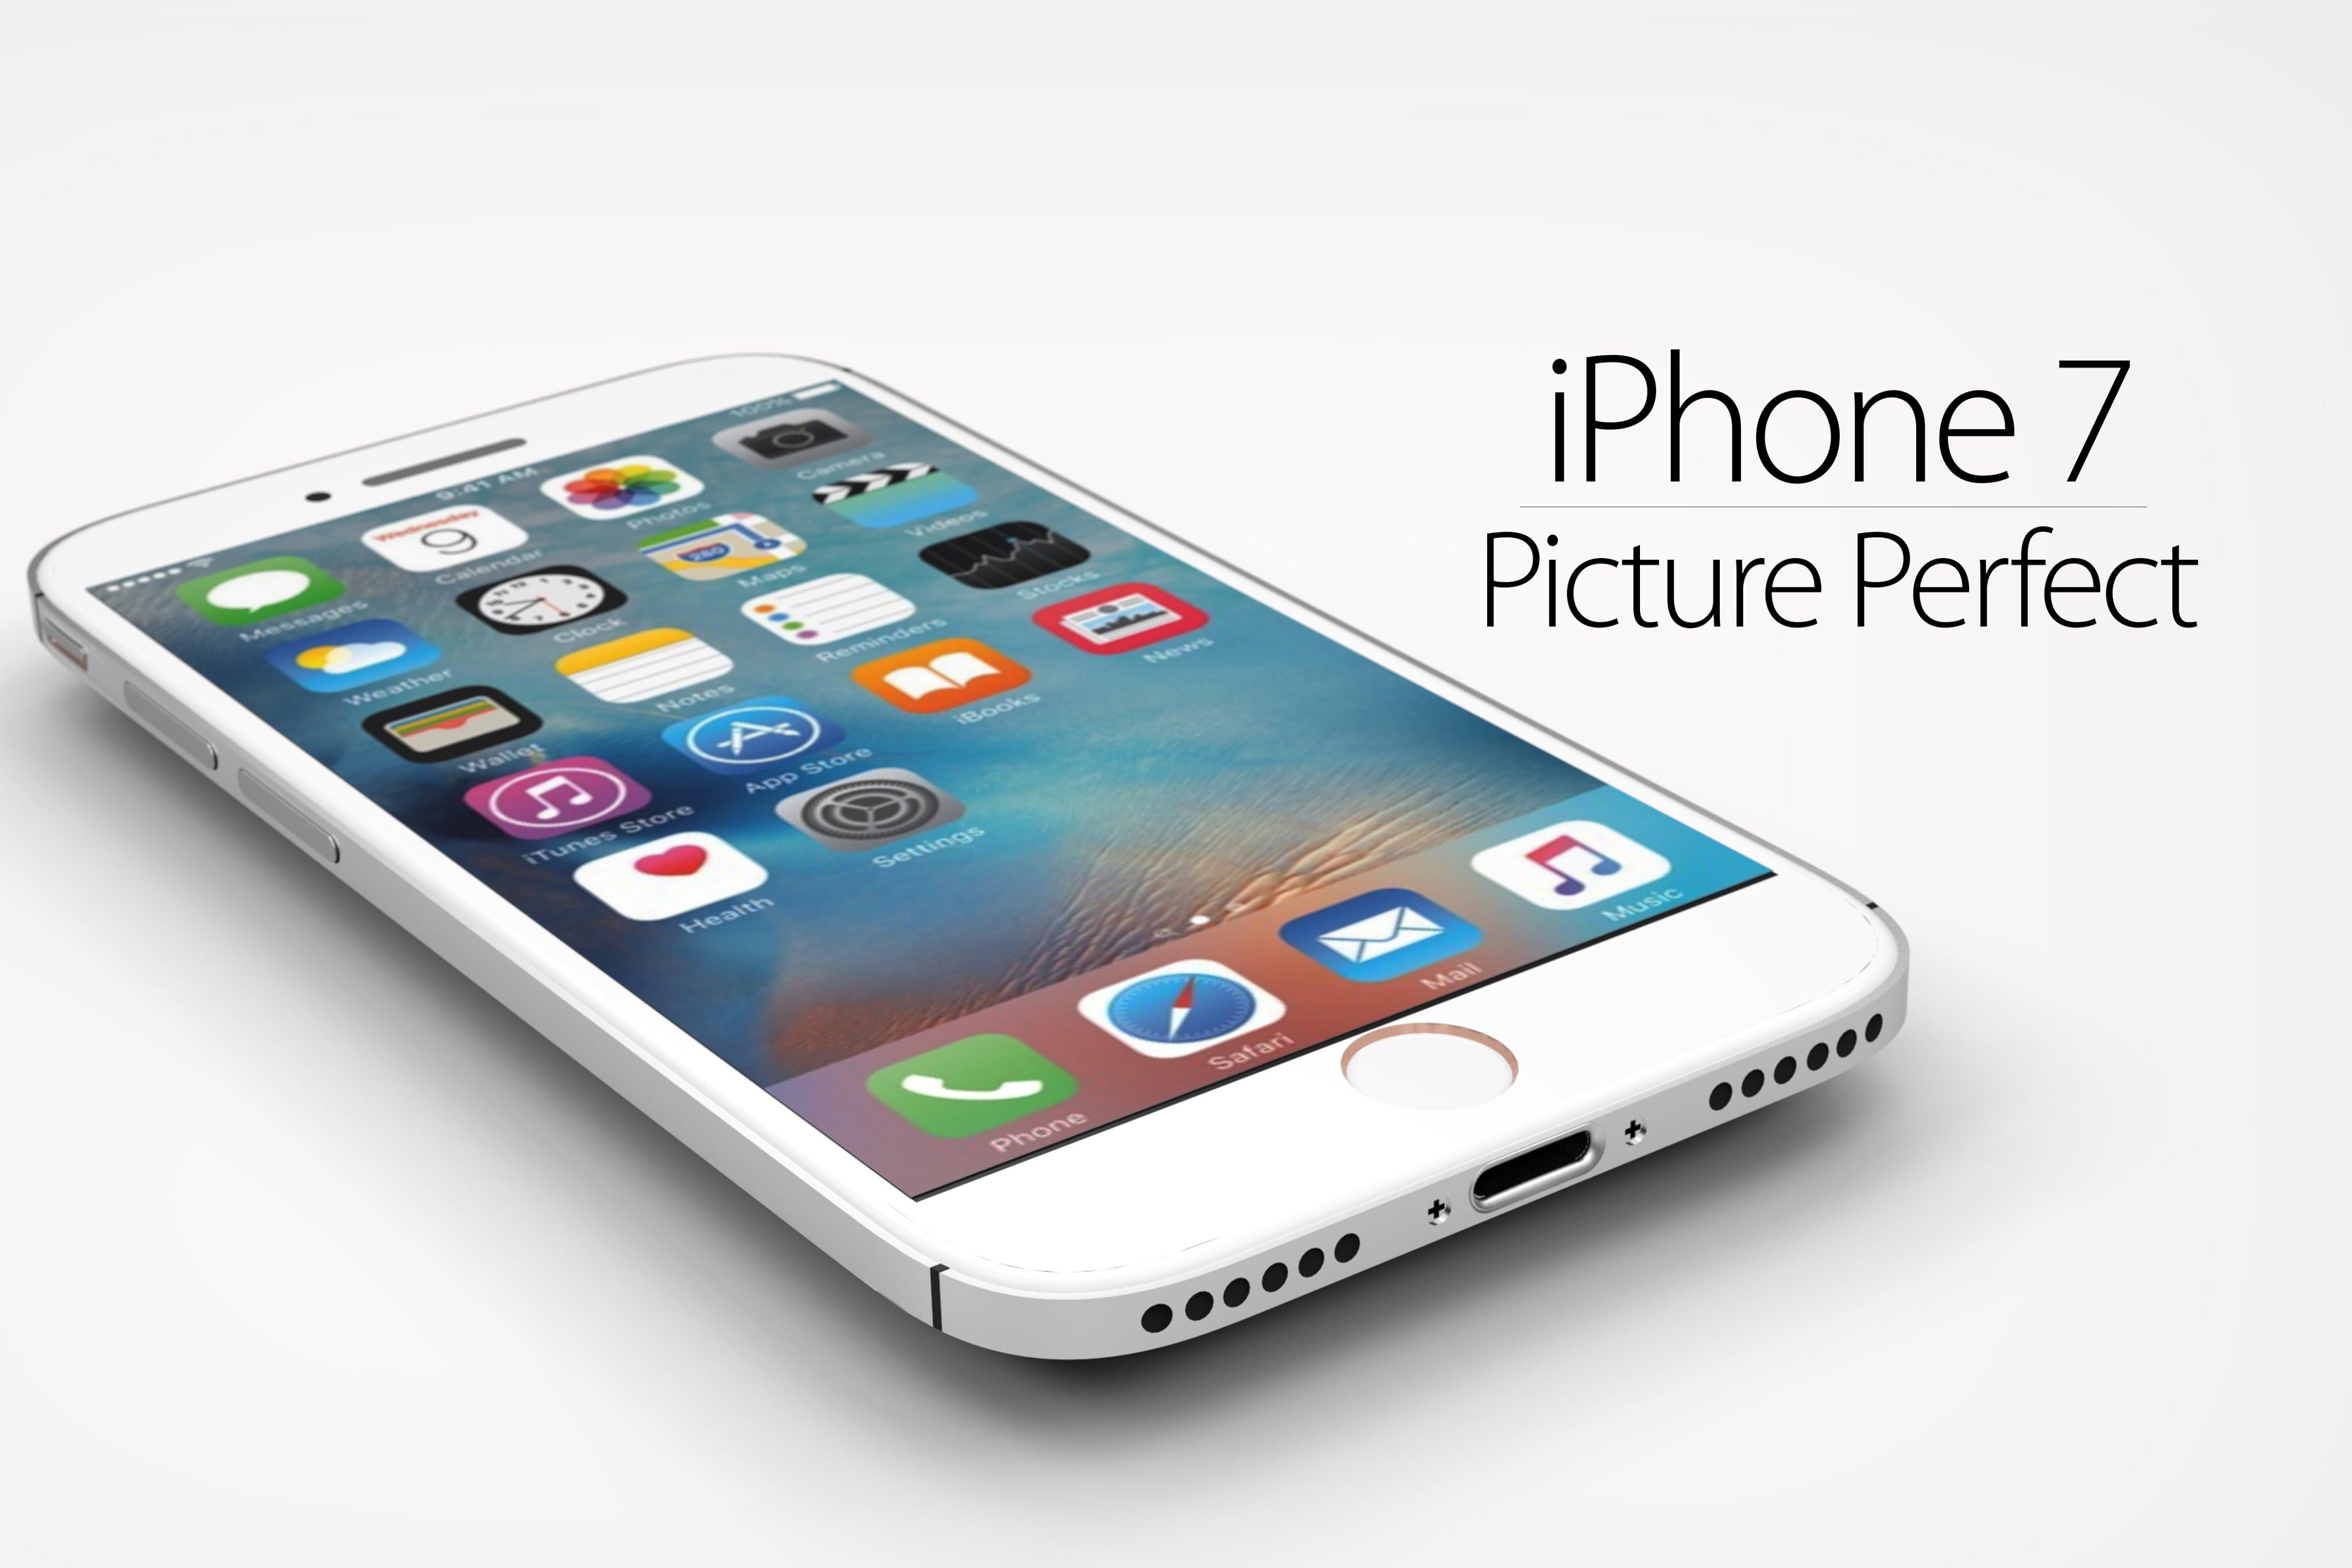 https://www.servicio-tecnico-apple.com/iphone-7